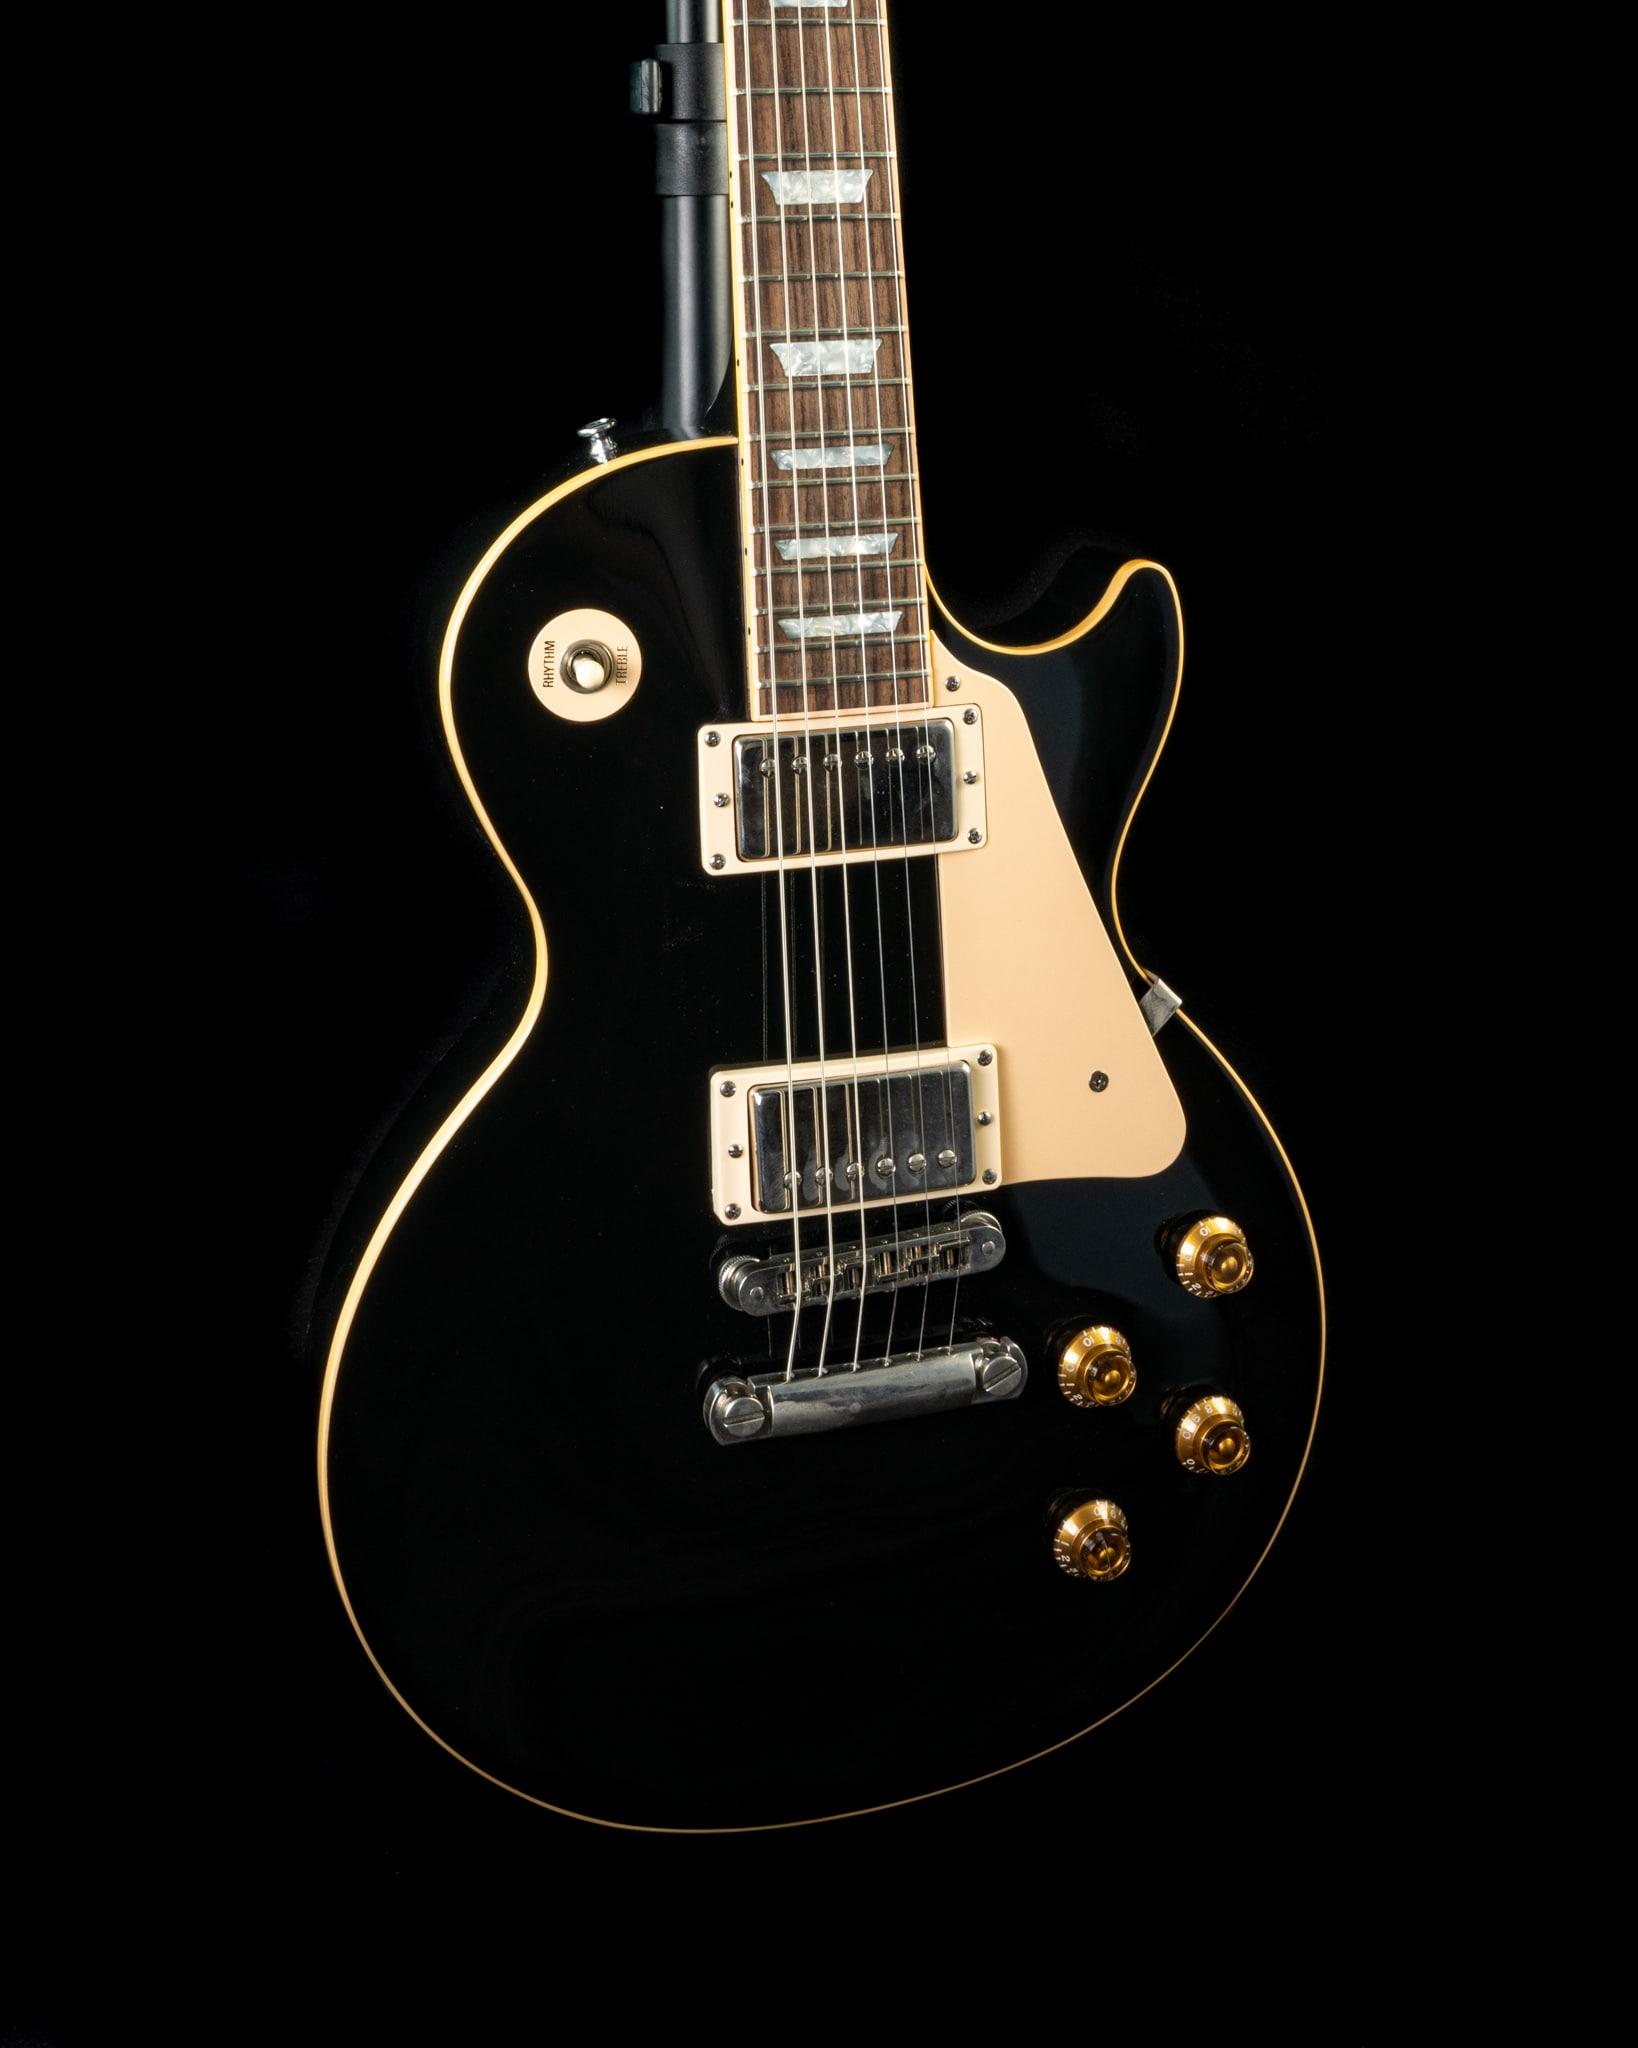 Gibson Les Paul Standard in Ebony, Pre-Owned